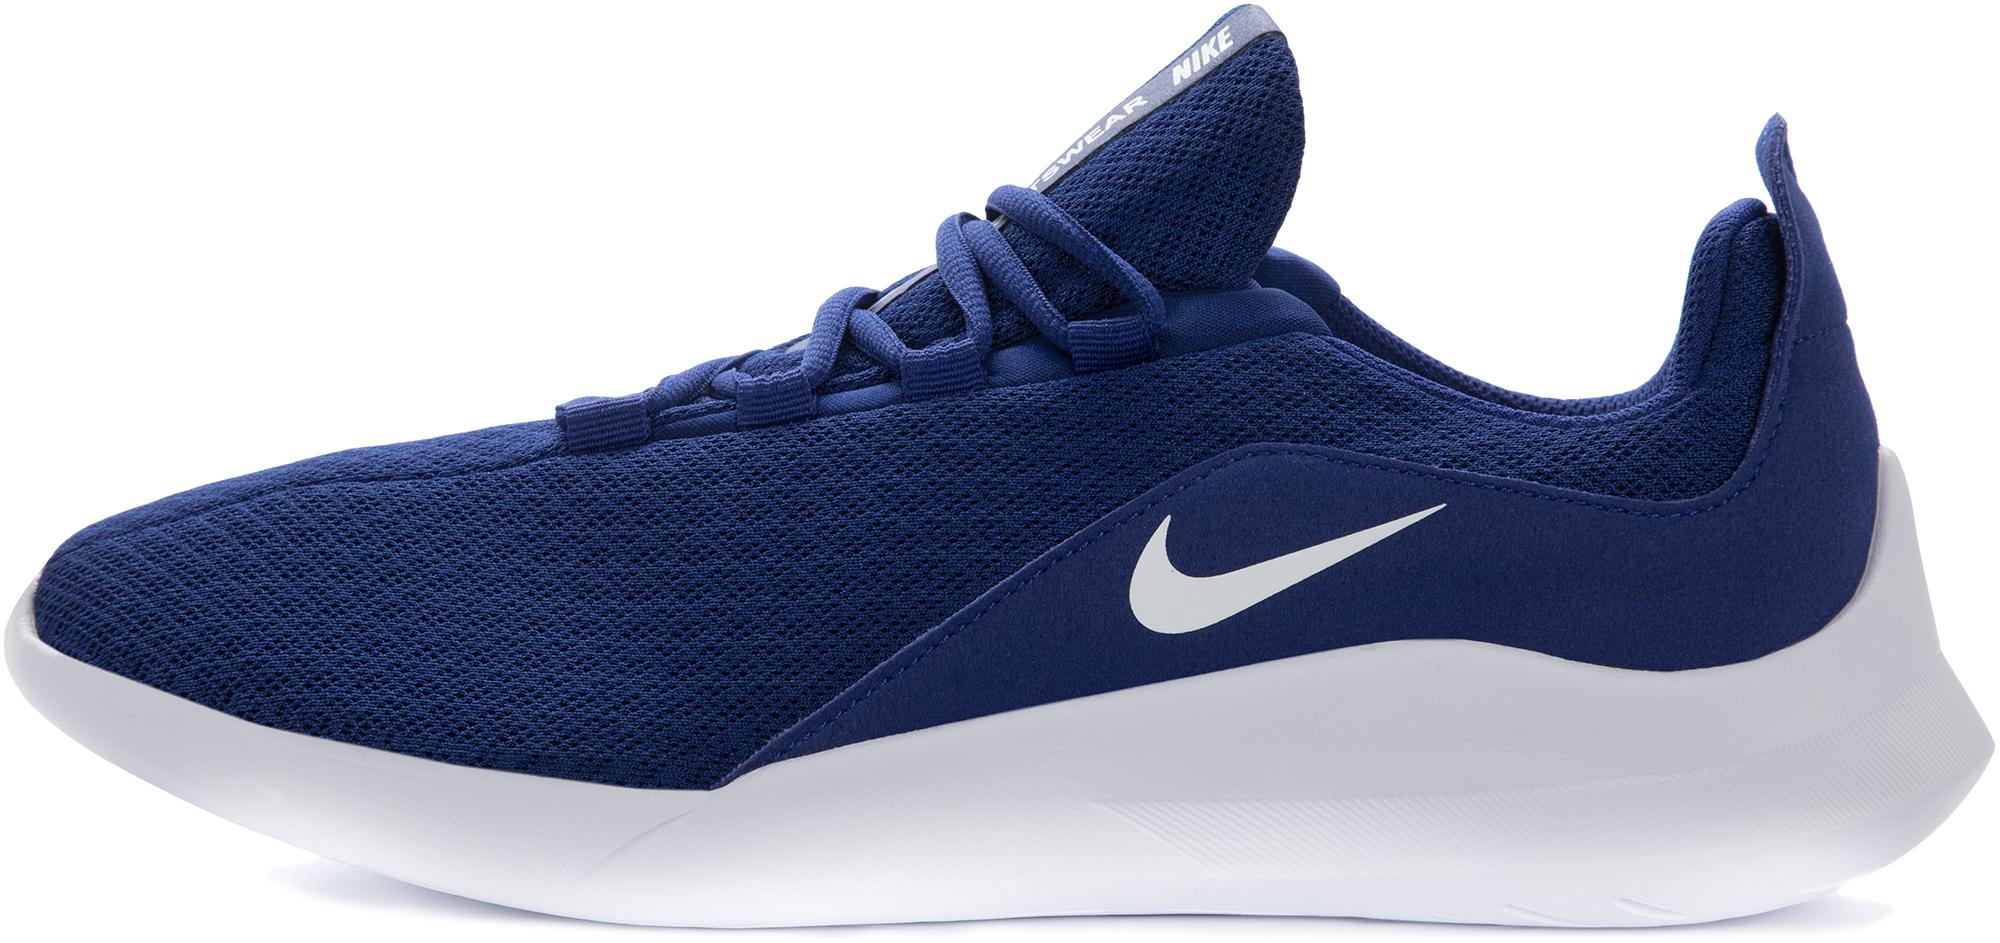 Nike Кроссовки мужские Nike Viale, размер 44